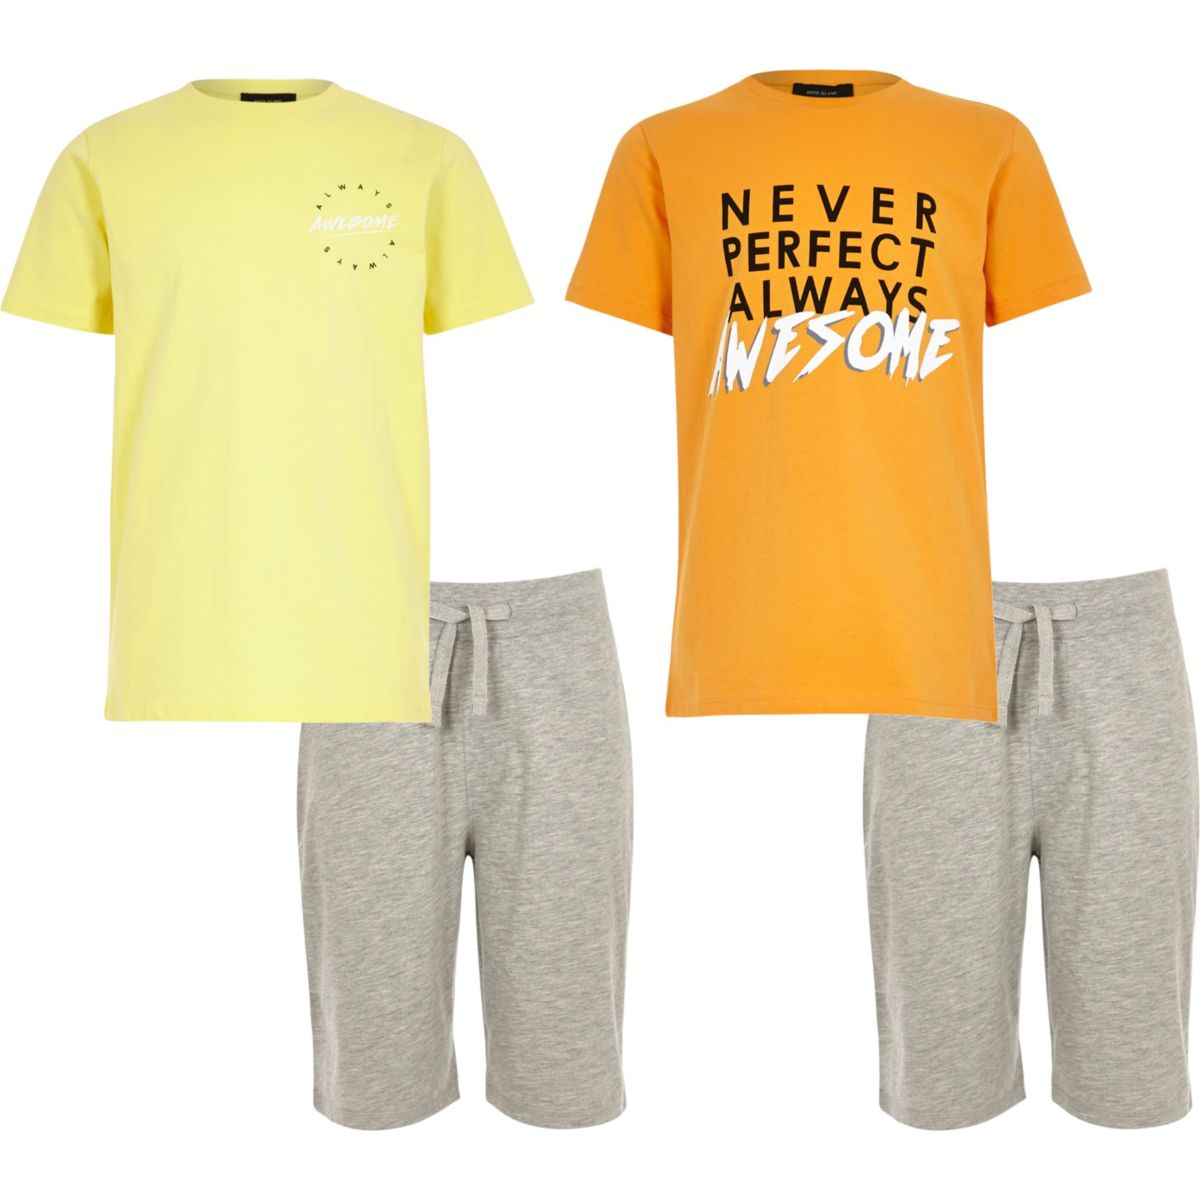 Lot de pyjamas jaune et orange pour garçon